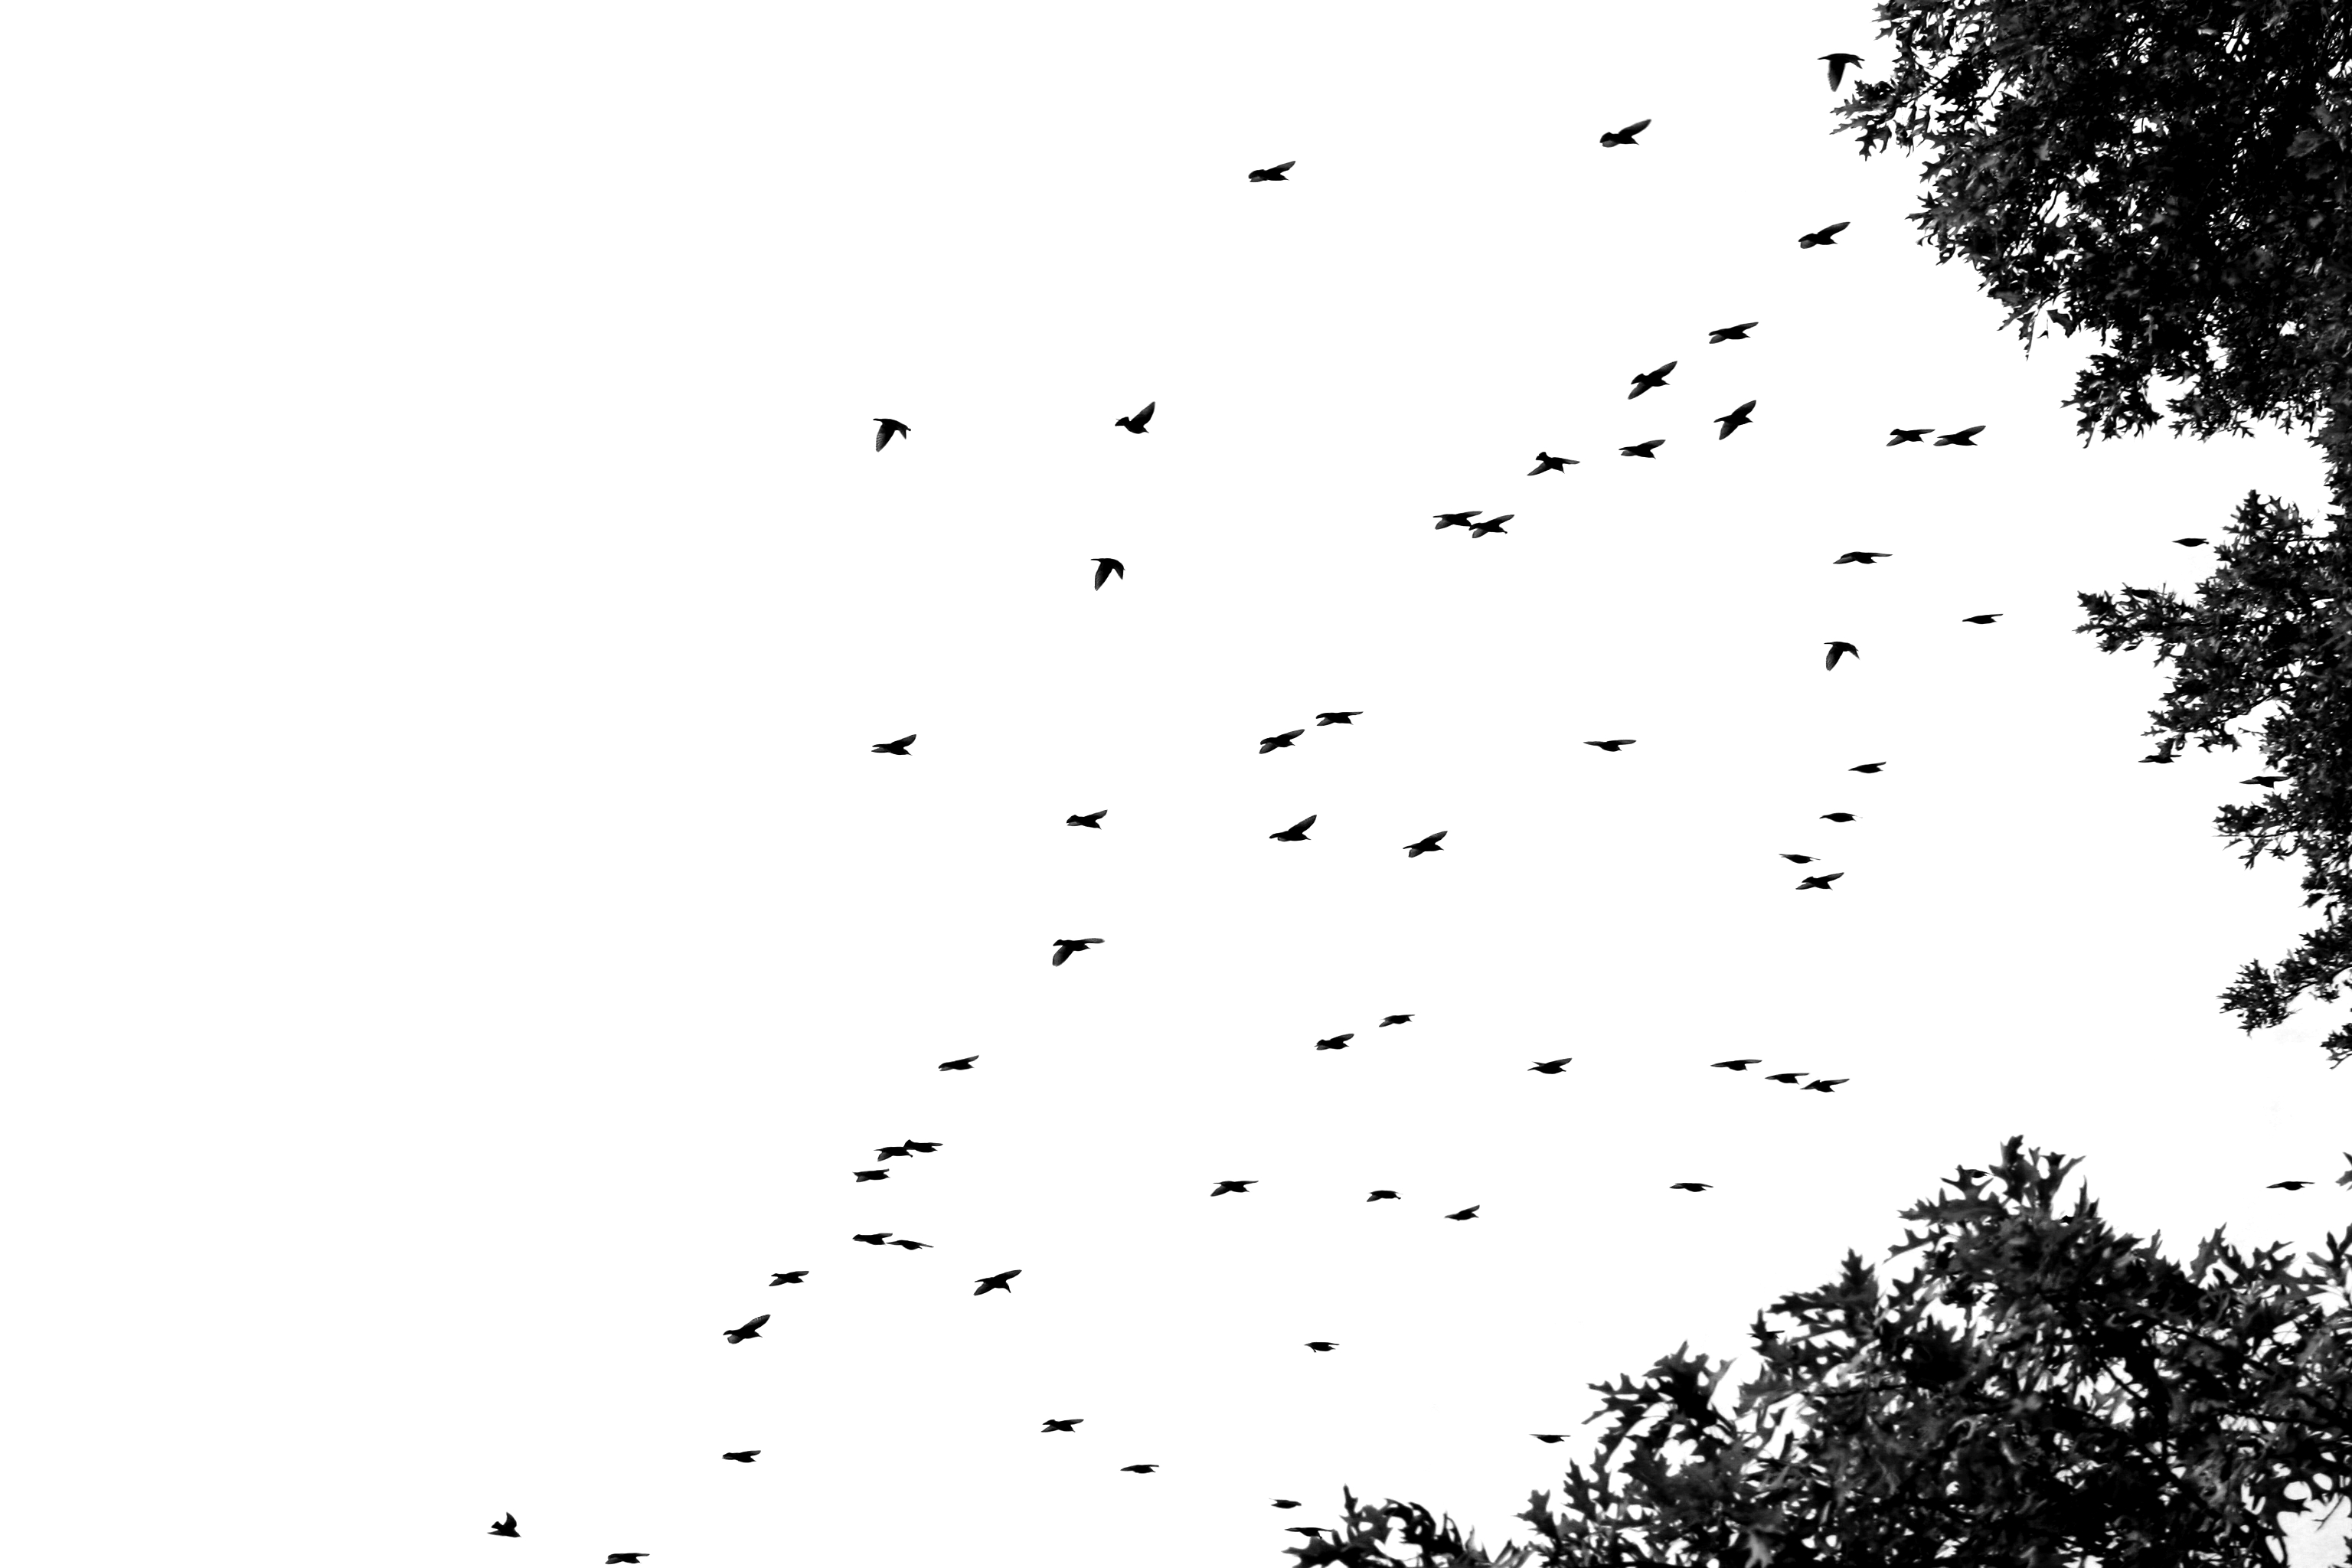 Flock Of Birds Sky Bokeh 14jpg Wallpaper 3072x2048 219275